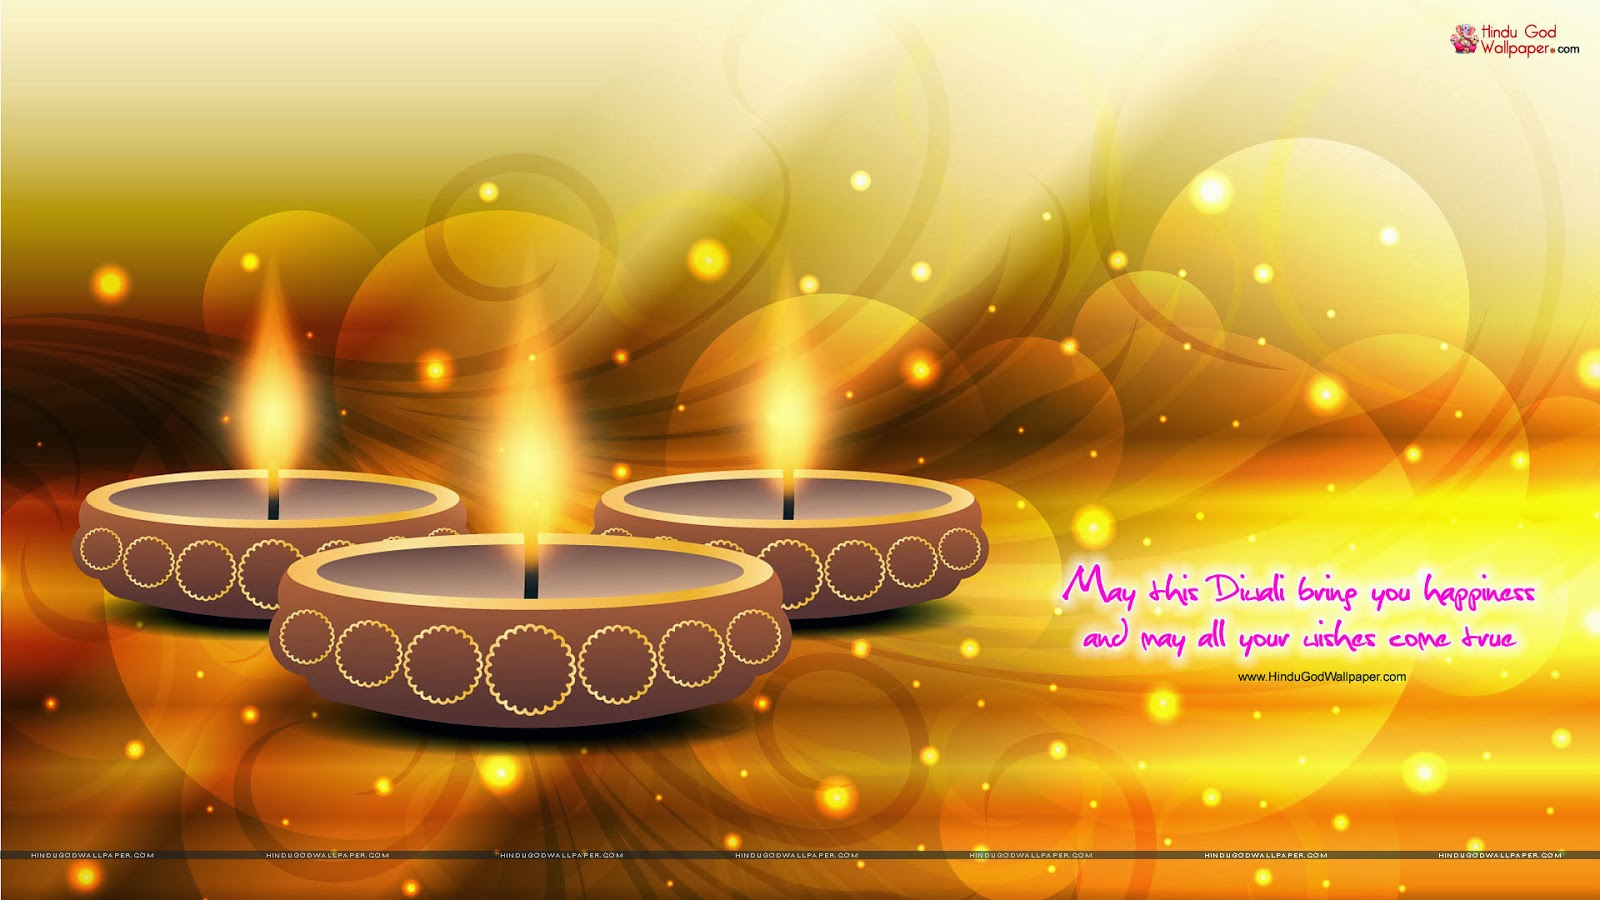 Panchmukhi Ganesh Wallpaper Hd Diwali Diya Hindu God Wallpapers Download